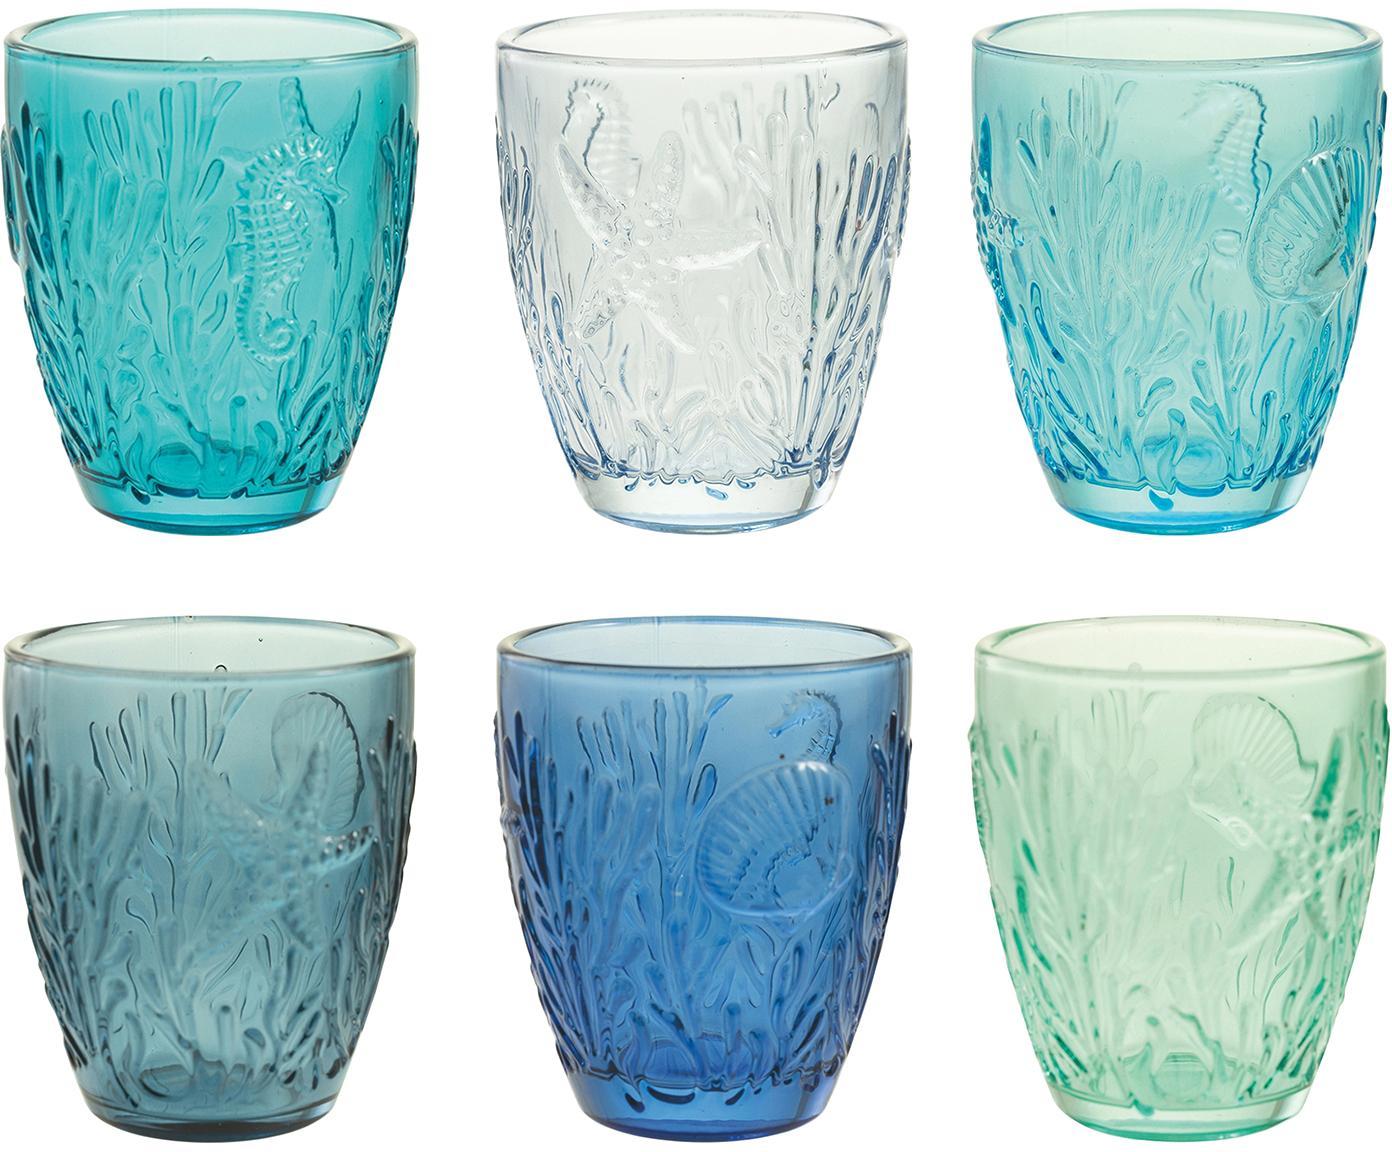 Waterglazenset Pantelleria, 6-delig, Glas, Blauwtinten, Ø 8 x H 10 cm